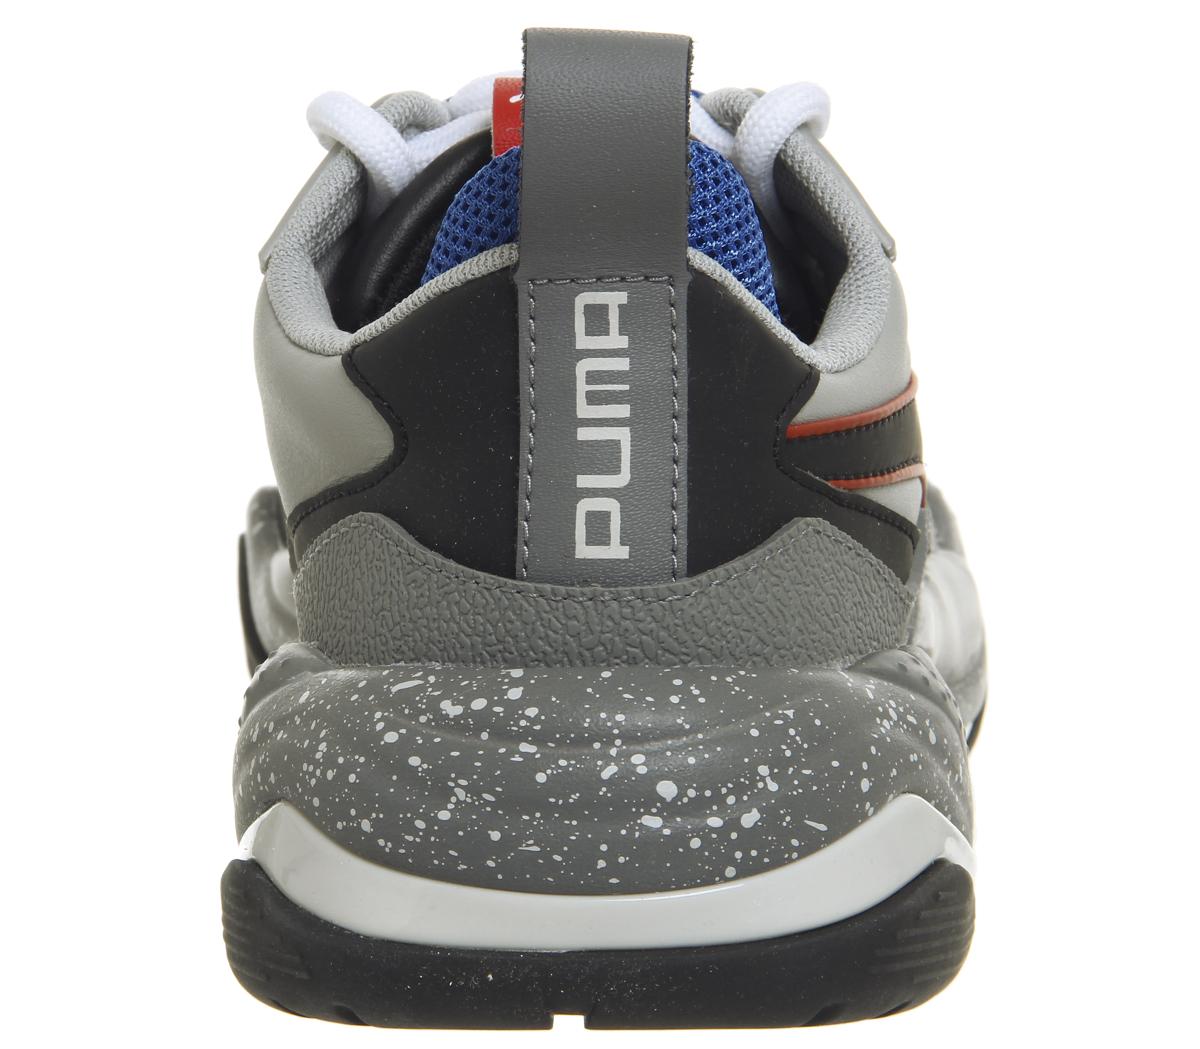 0ffea85d398ad2 Womens Puma Thunder Electric Trainers Grey Violet Puma Black ...